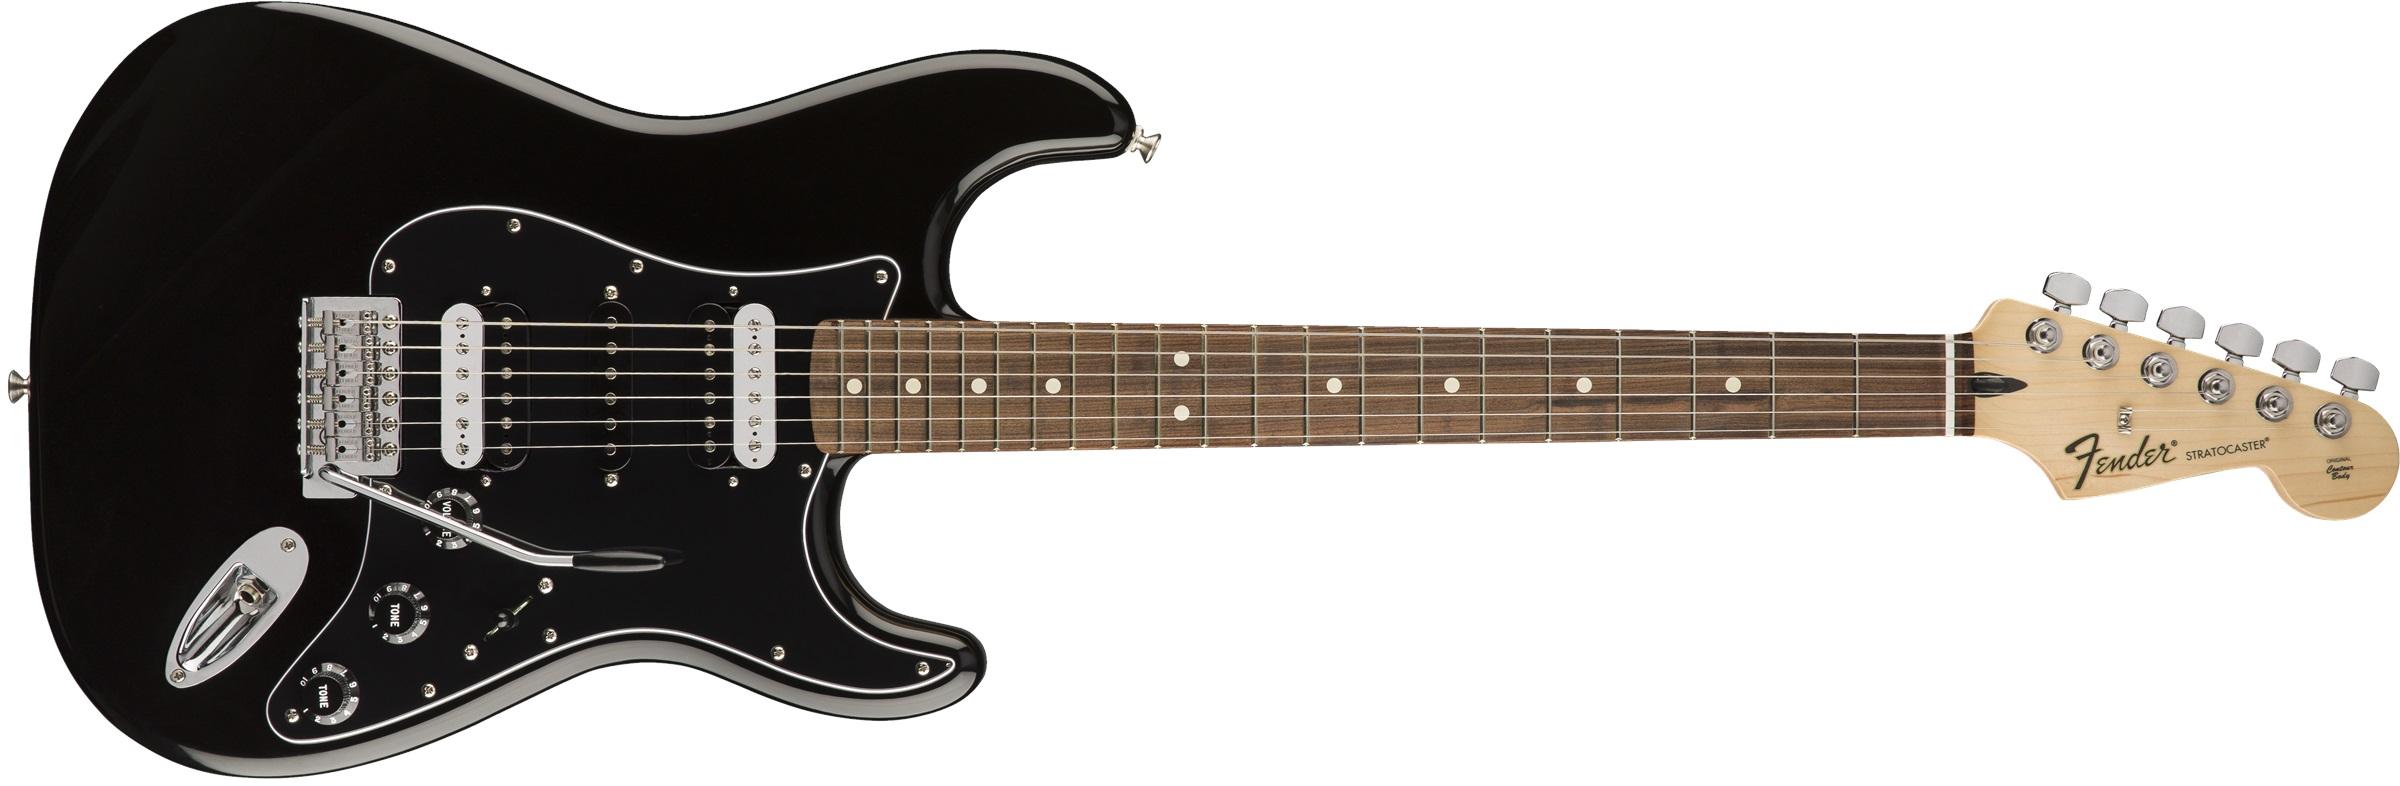 Fender Standard Stratocaster HSH PF BLK